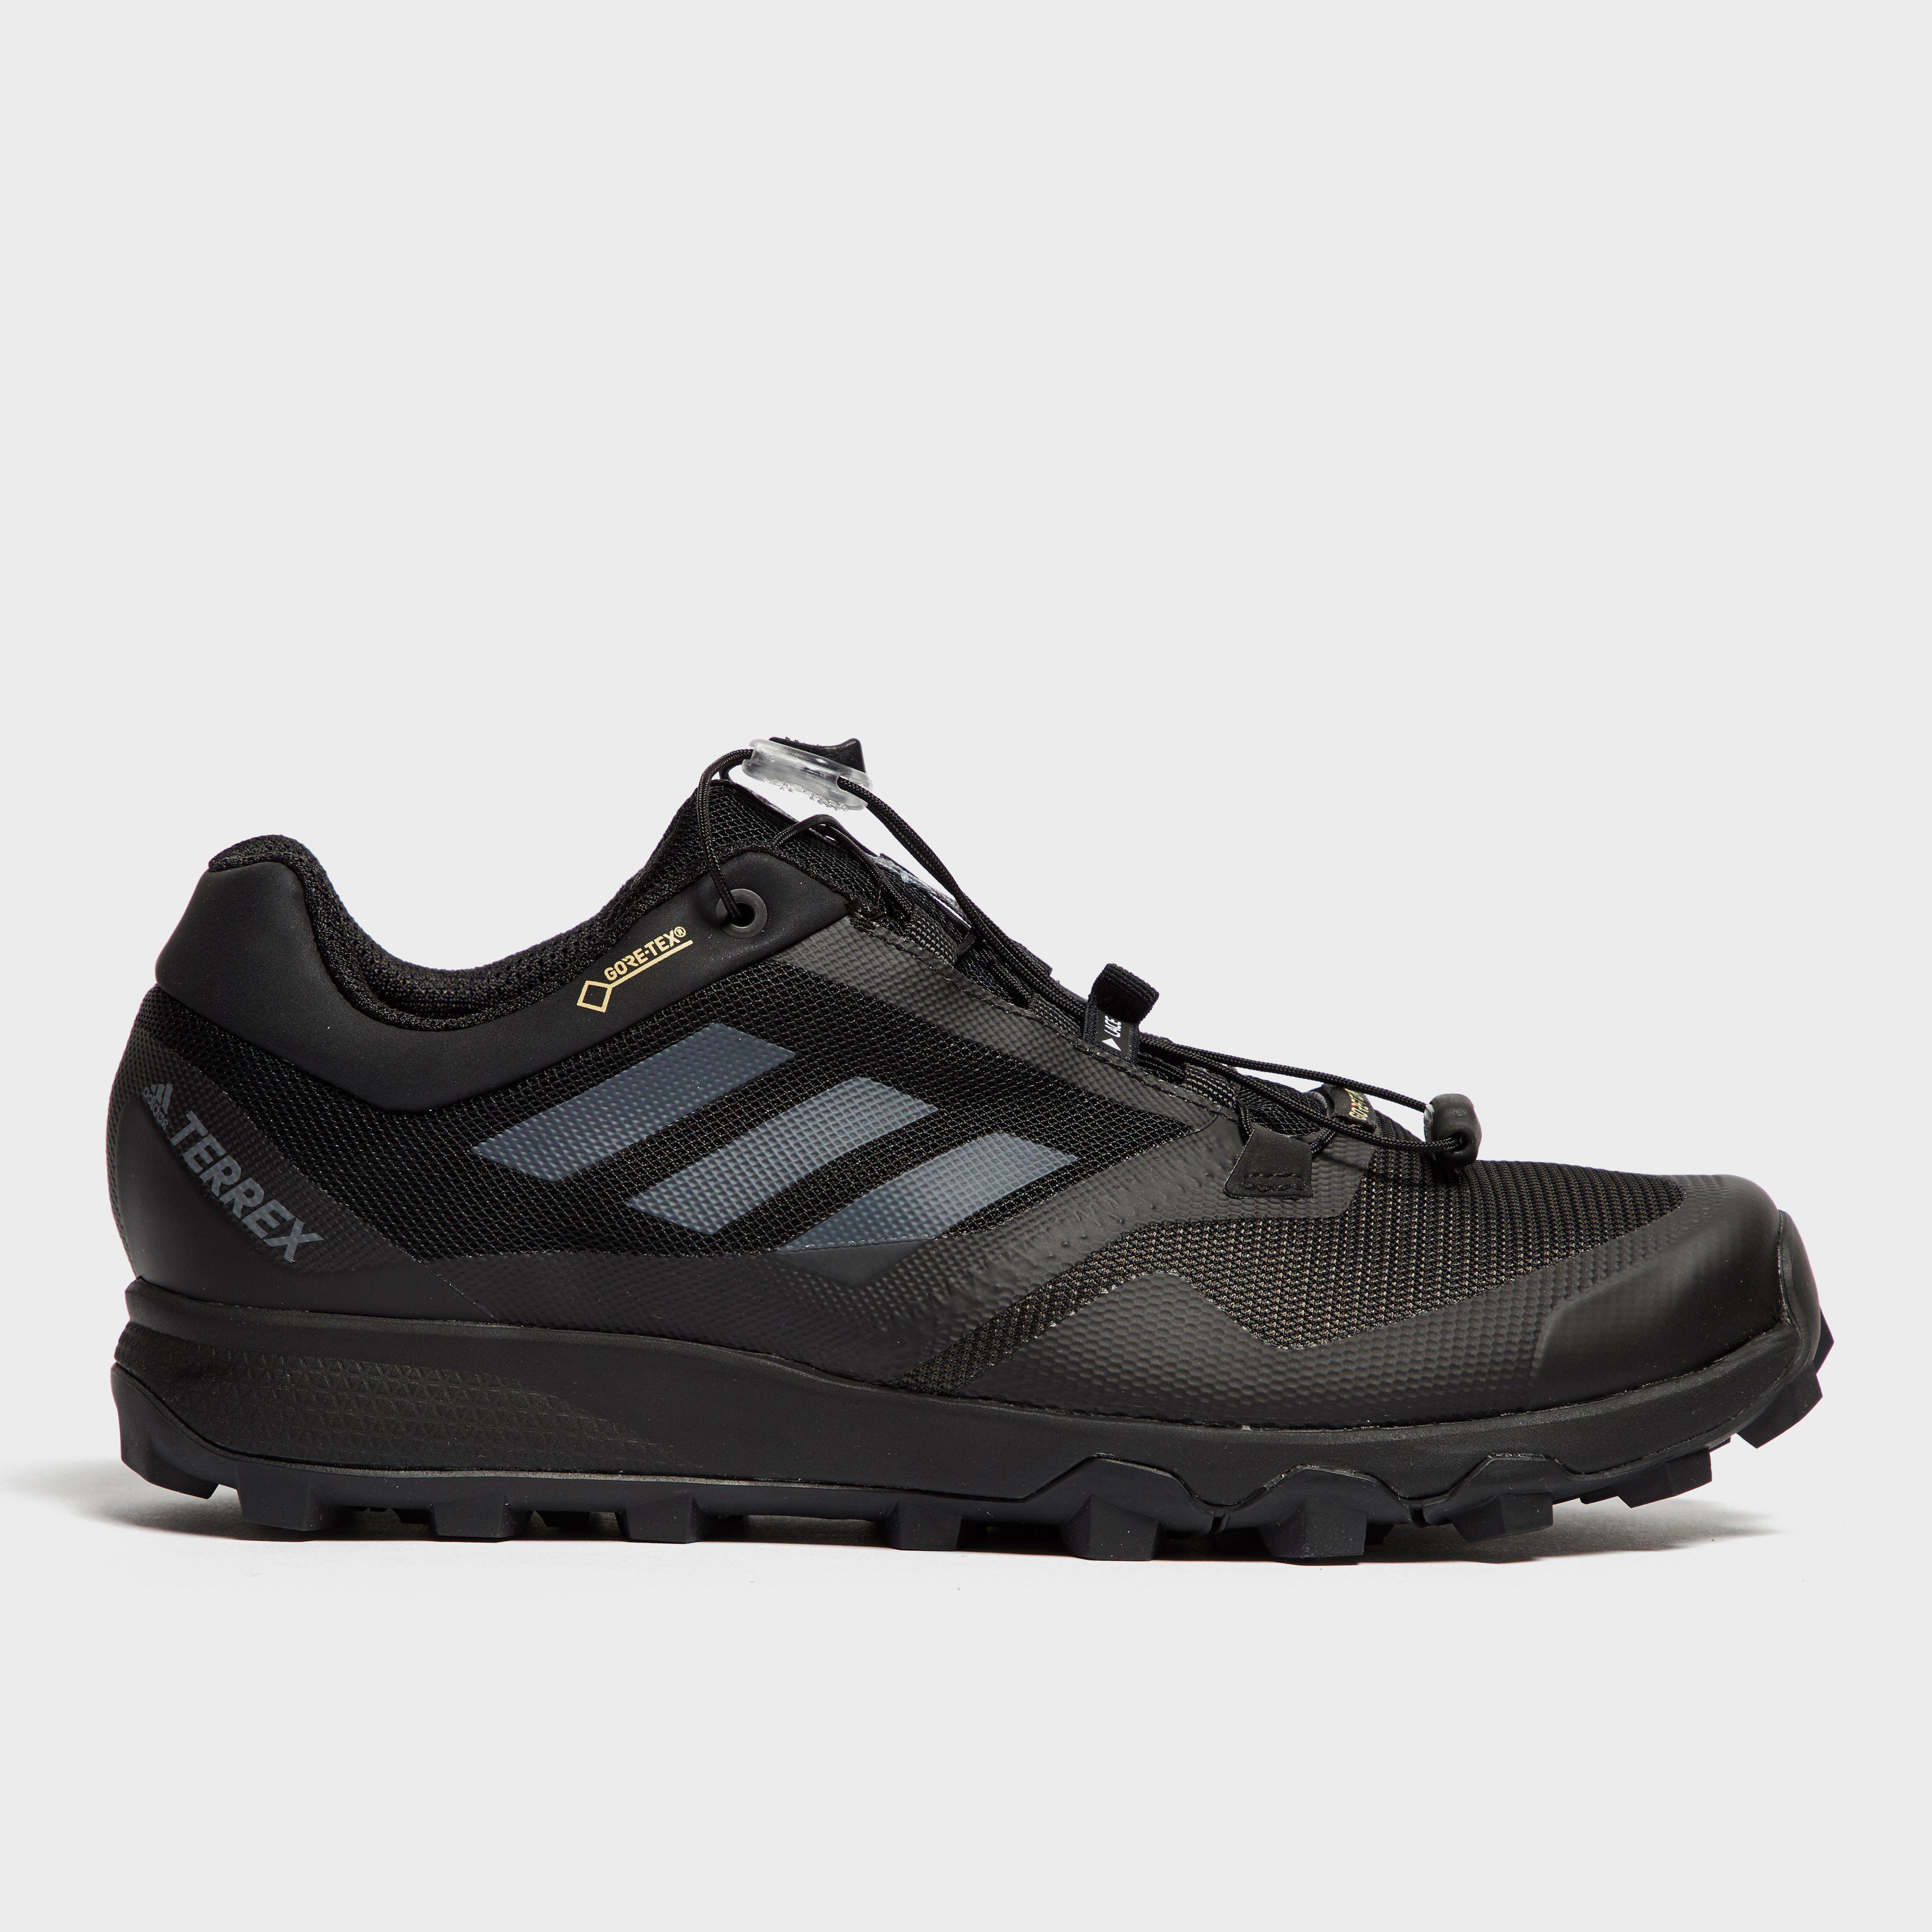 ADIDAS Men's Terrex Trailmaker GORE-TEX® Shoes